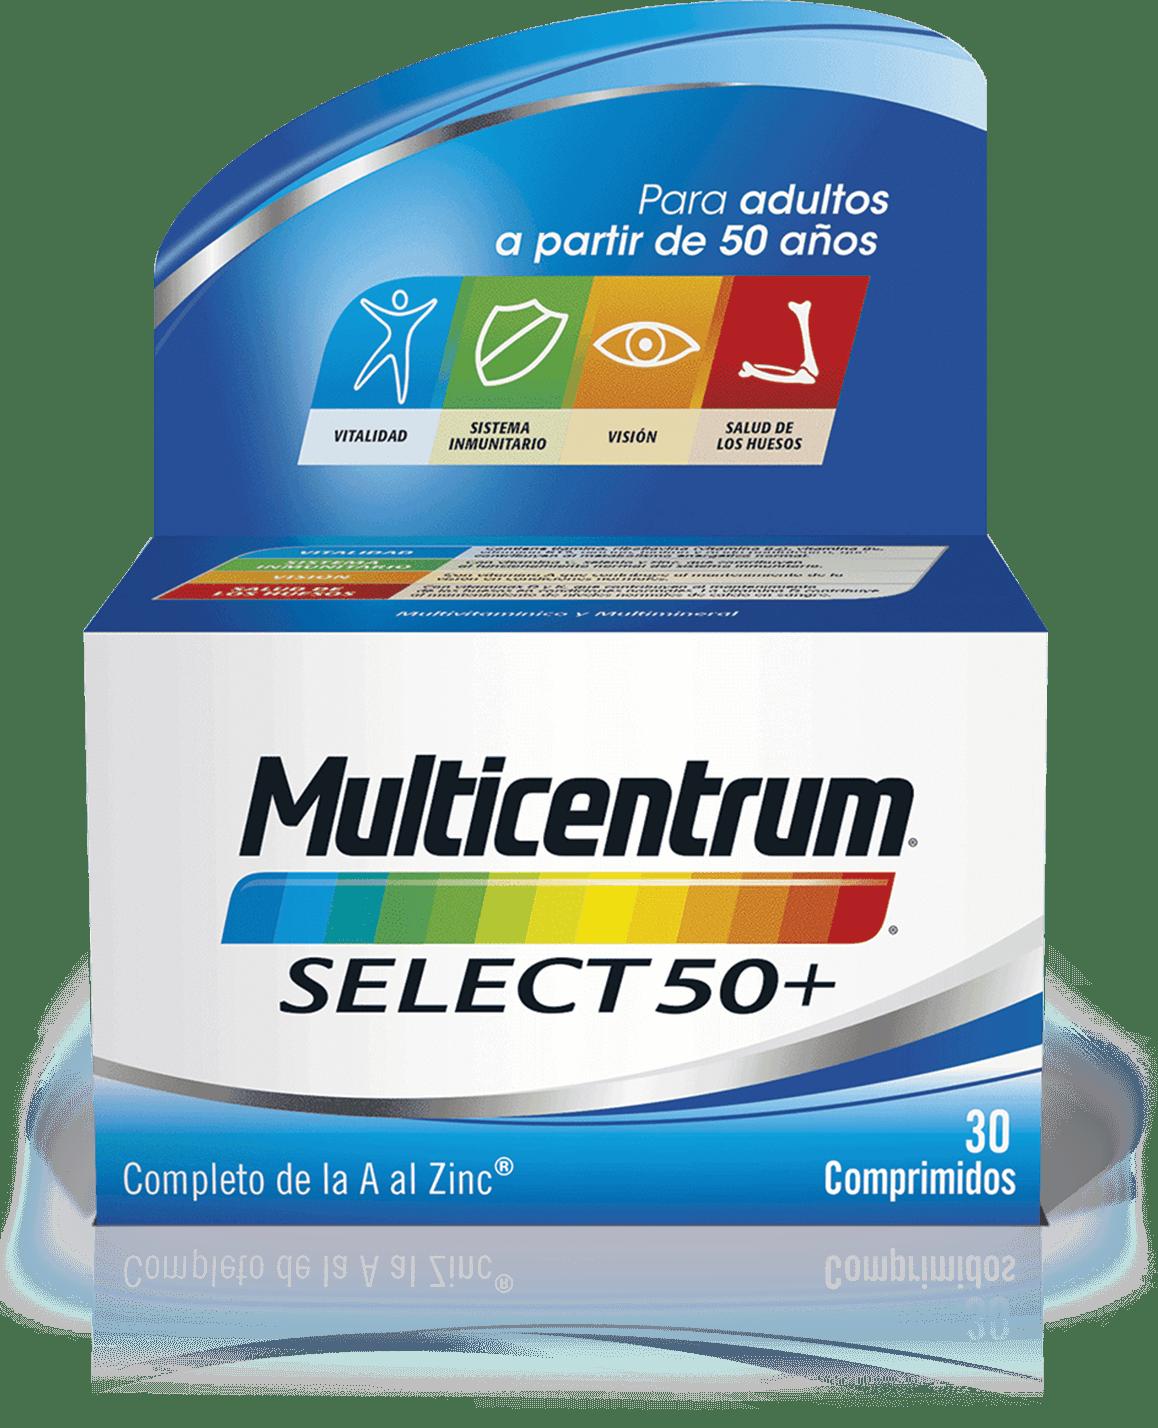 Imagen de producto de Multicentrum 50+